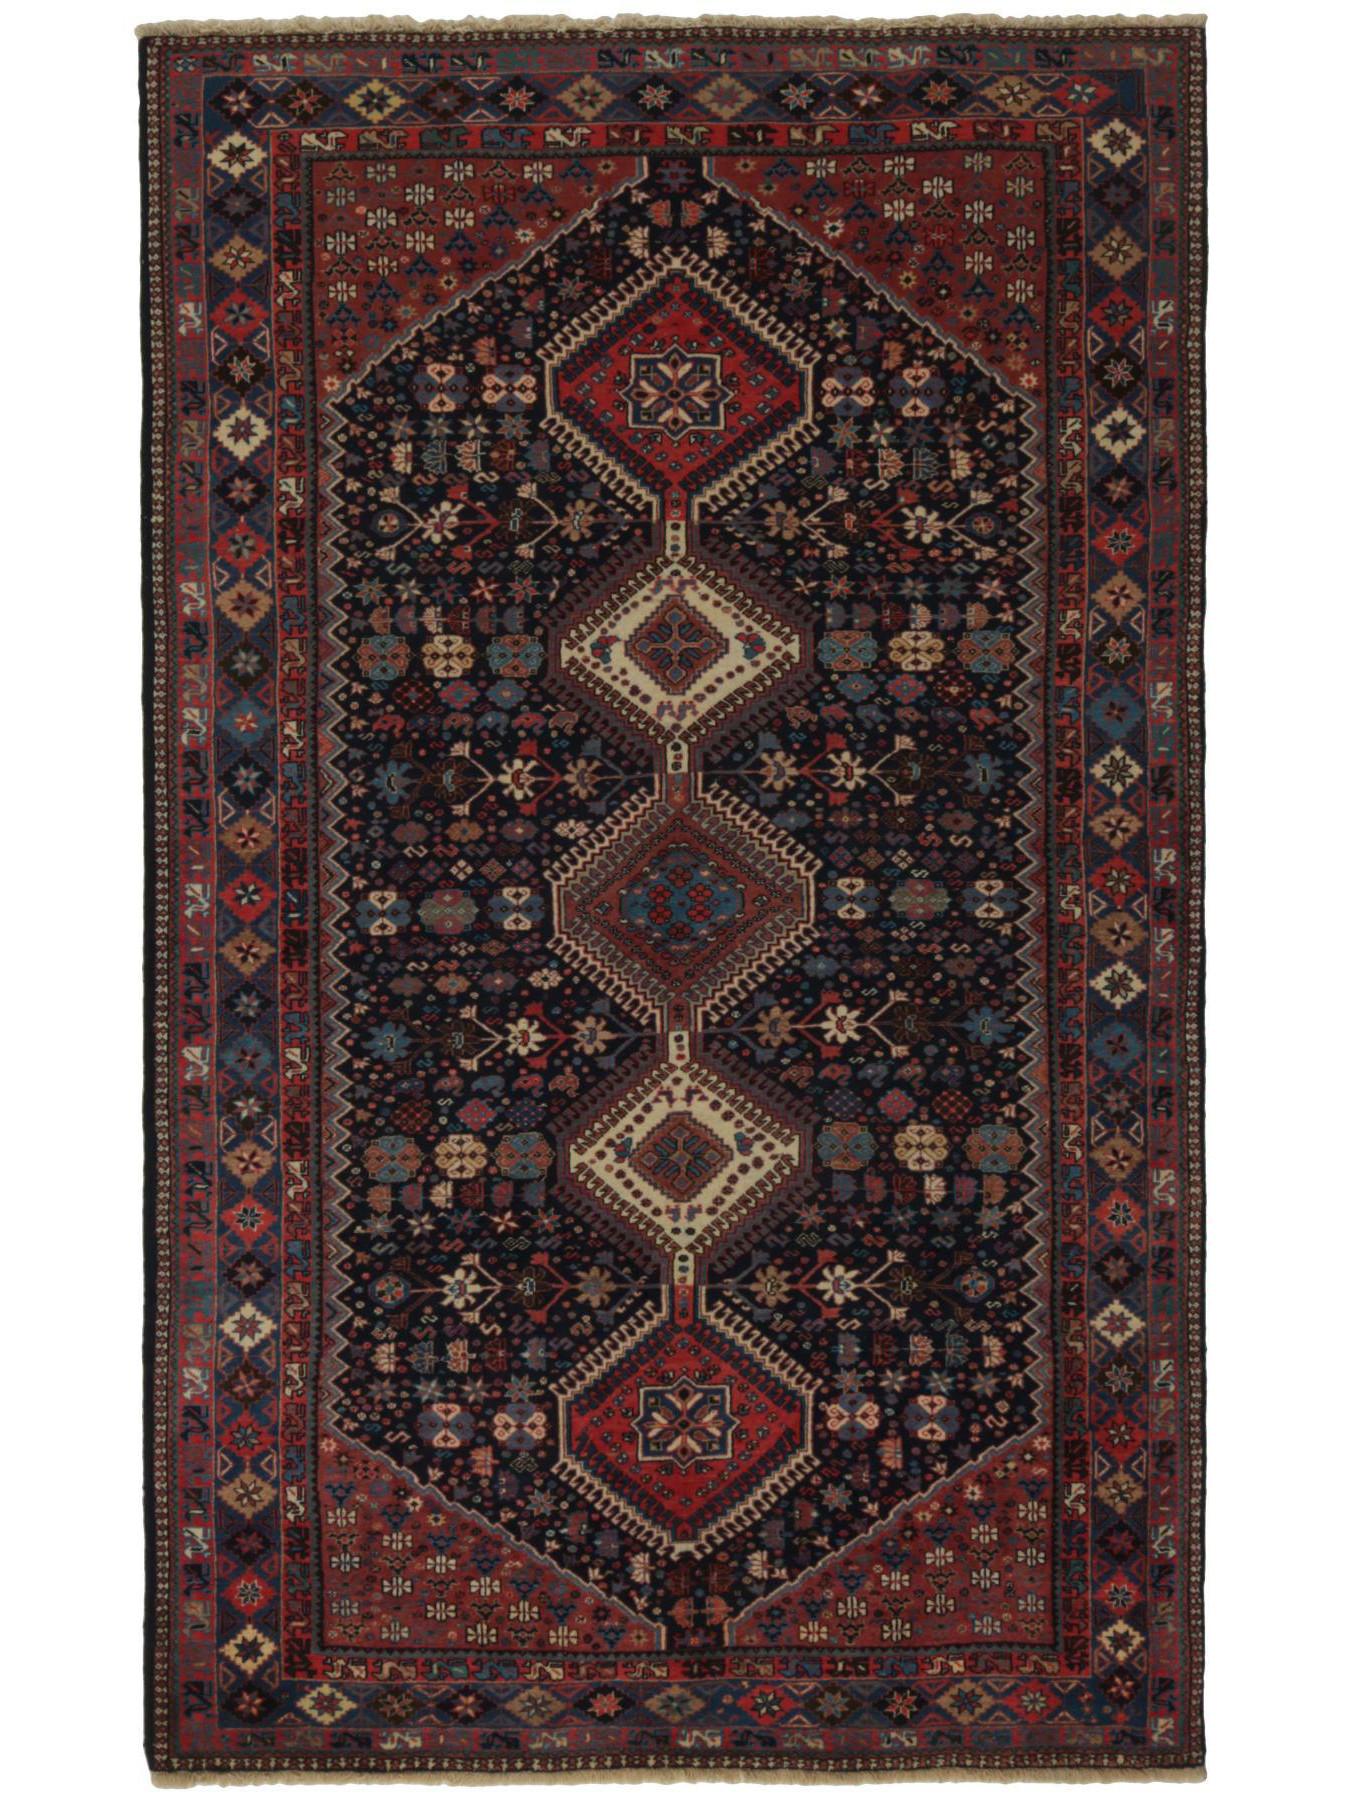 Perzische tapijten - Yalameh Sherkat